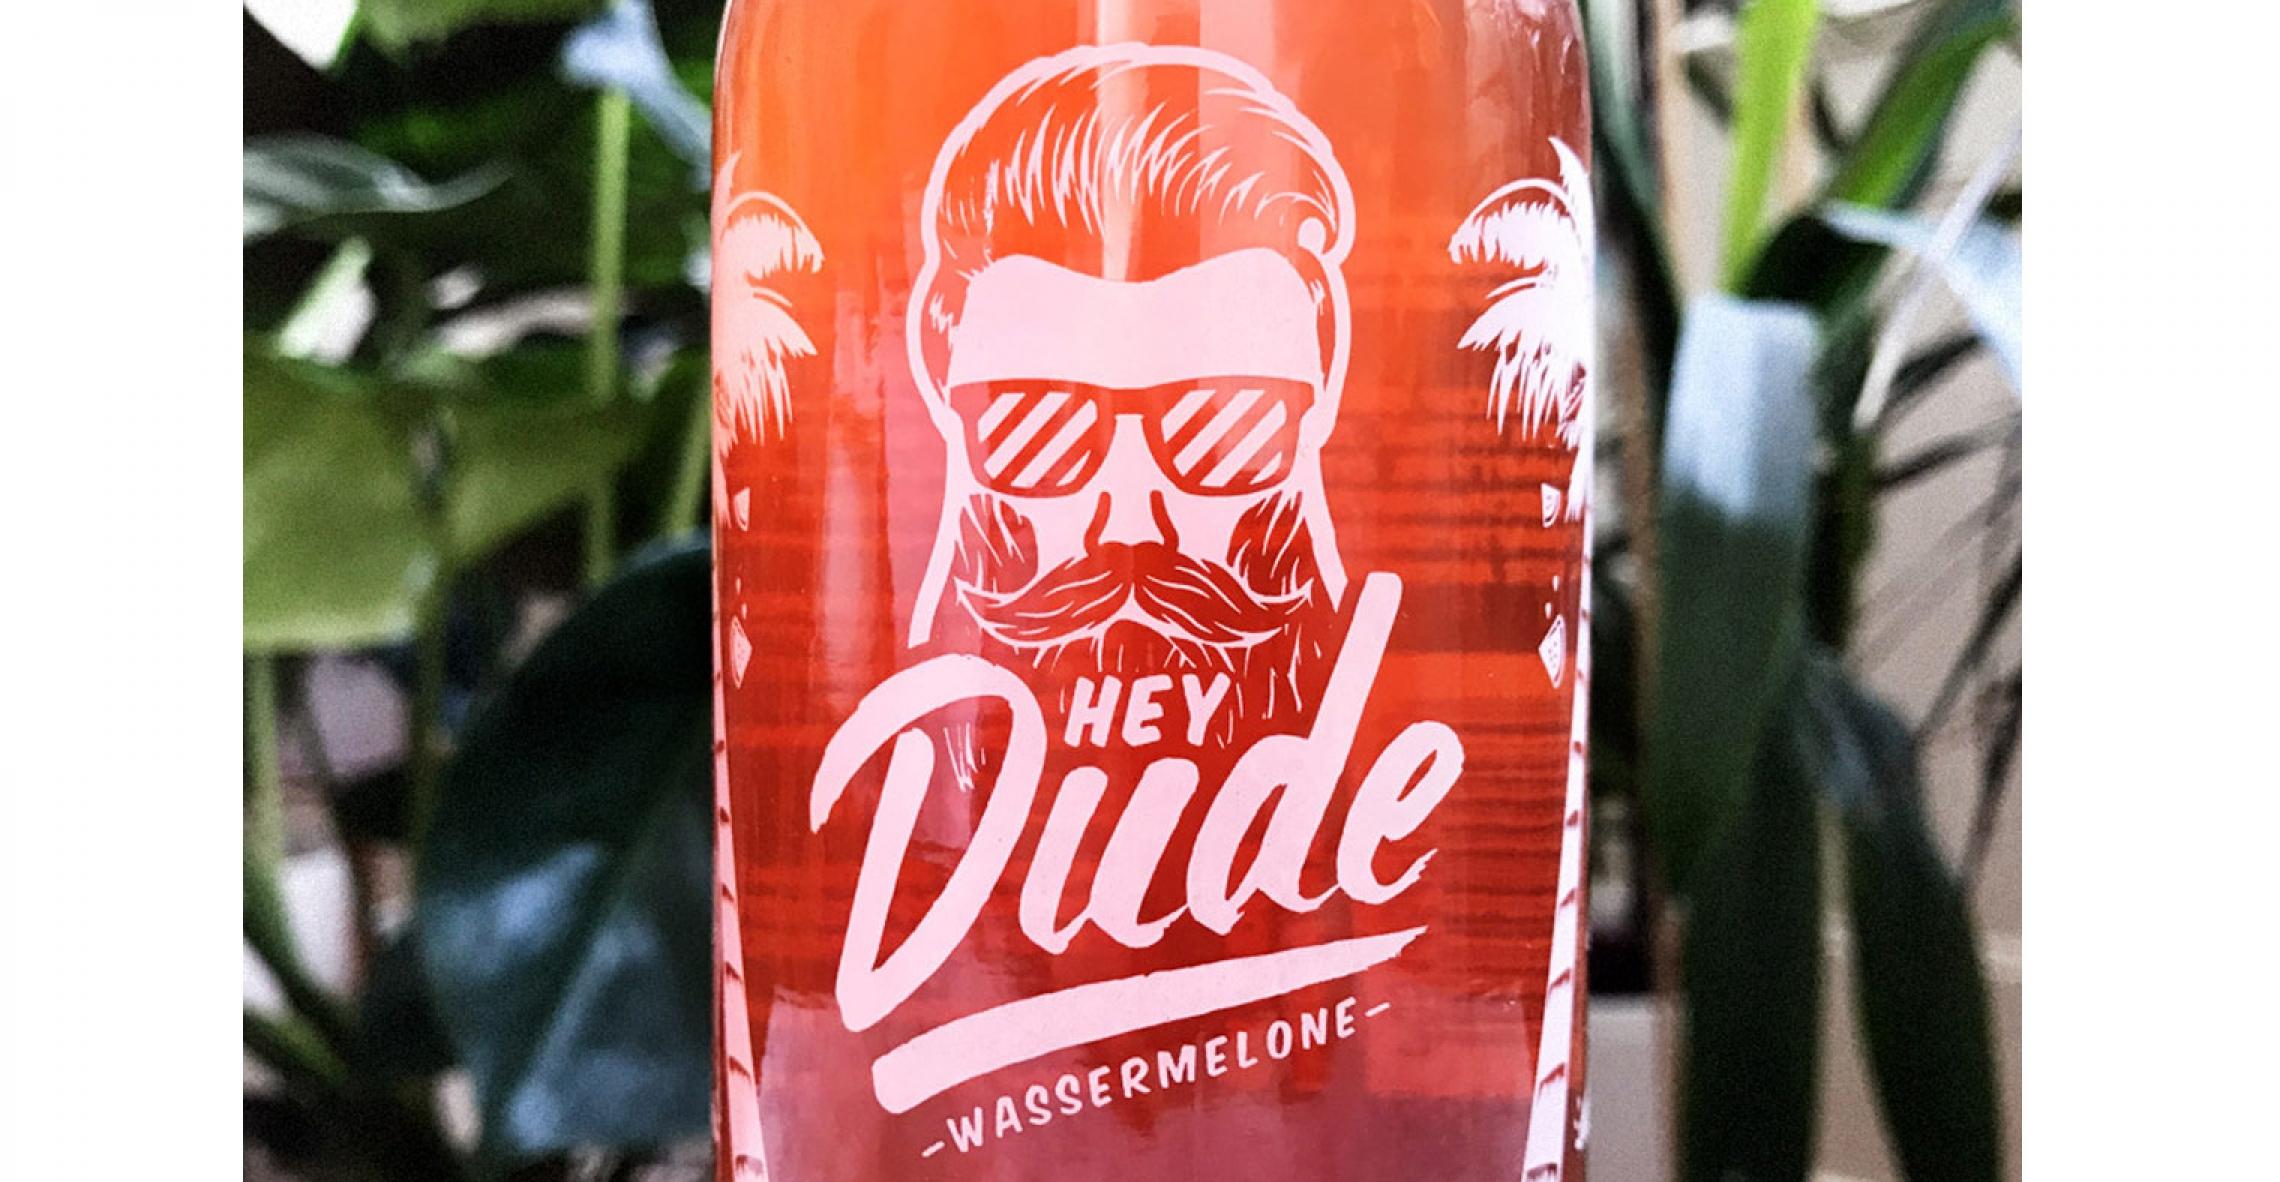 Netzwerk 11 |Hey Dude